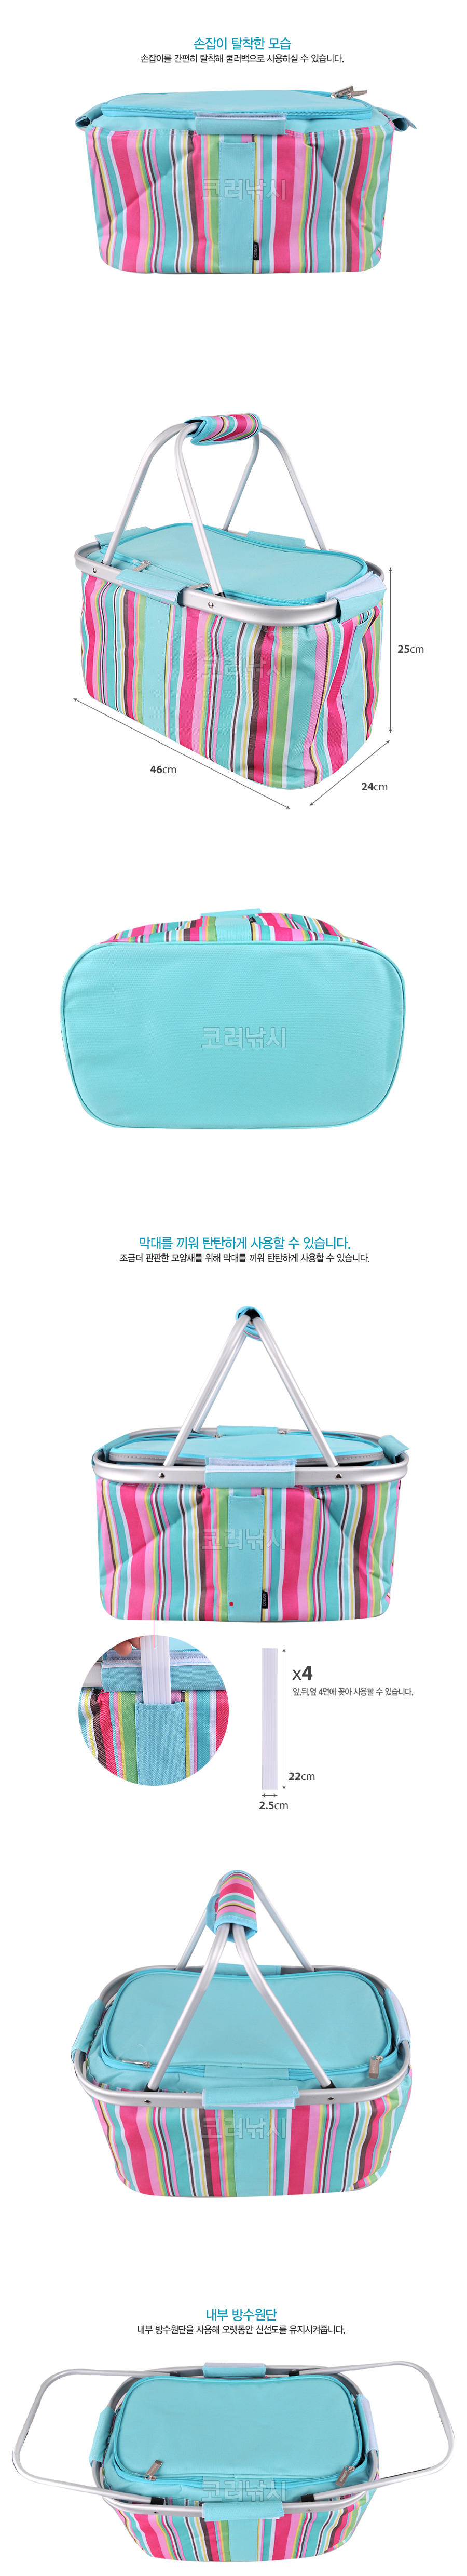 picnic soft bag 25리터아이스백 코스모스 피크닉 소프트백 쿨러백